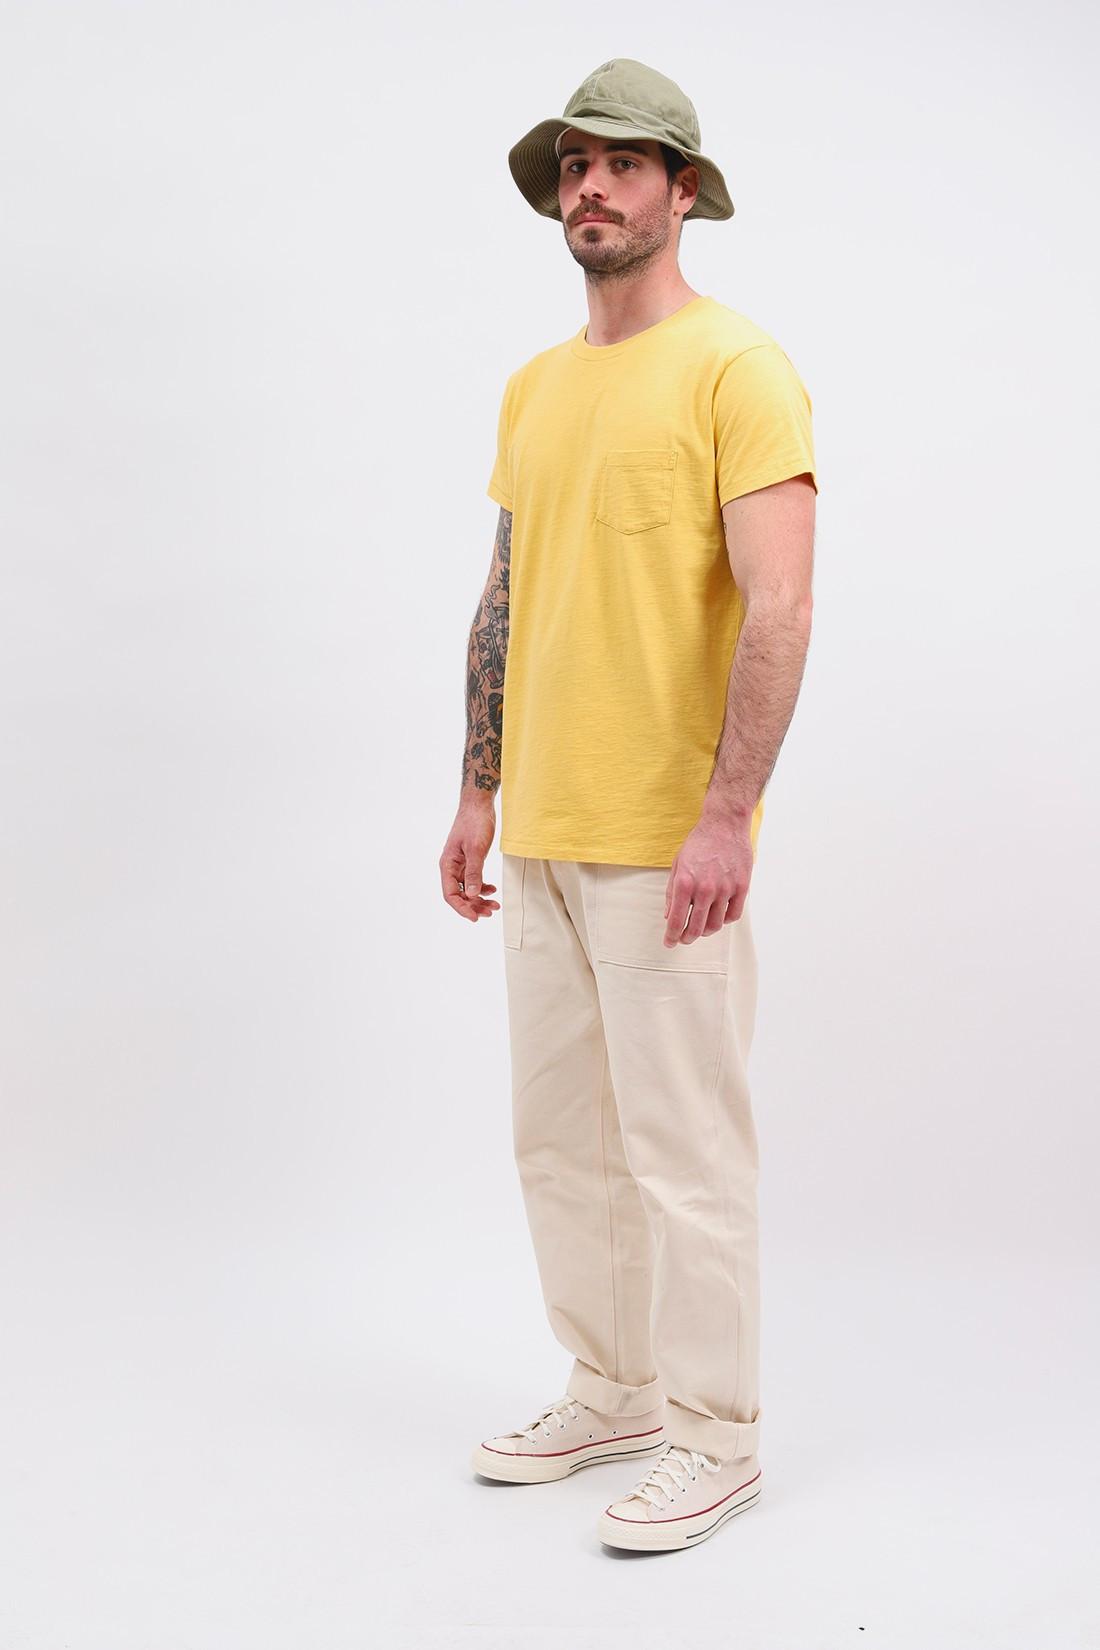 LEVI'S ® VINTAGE CLOTHING / 1950s sportswear tee Mist